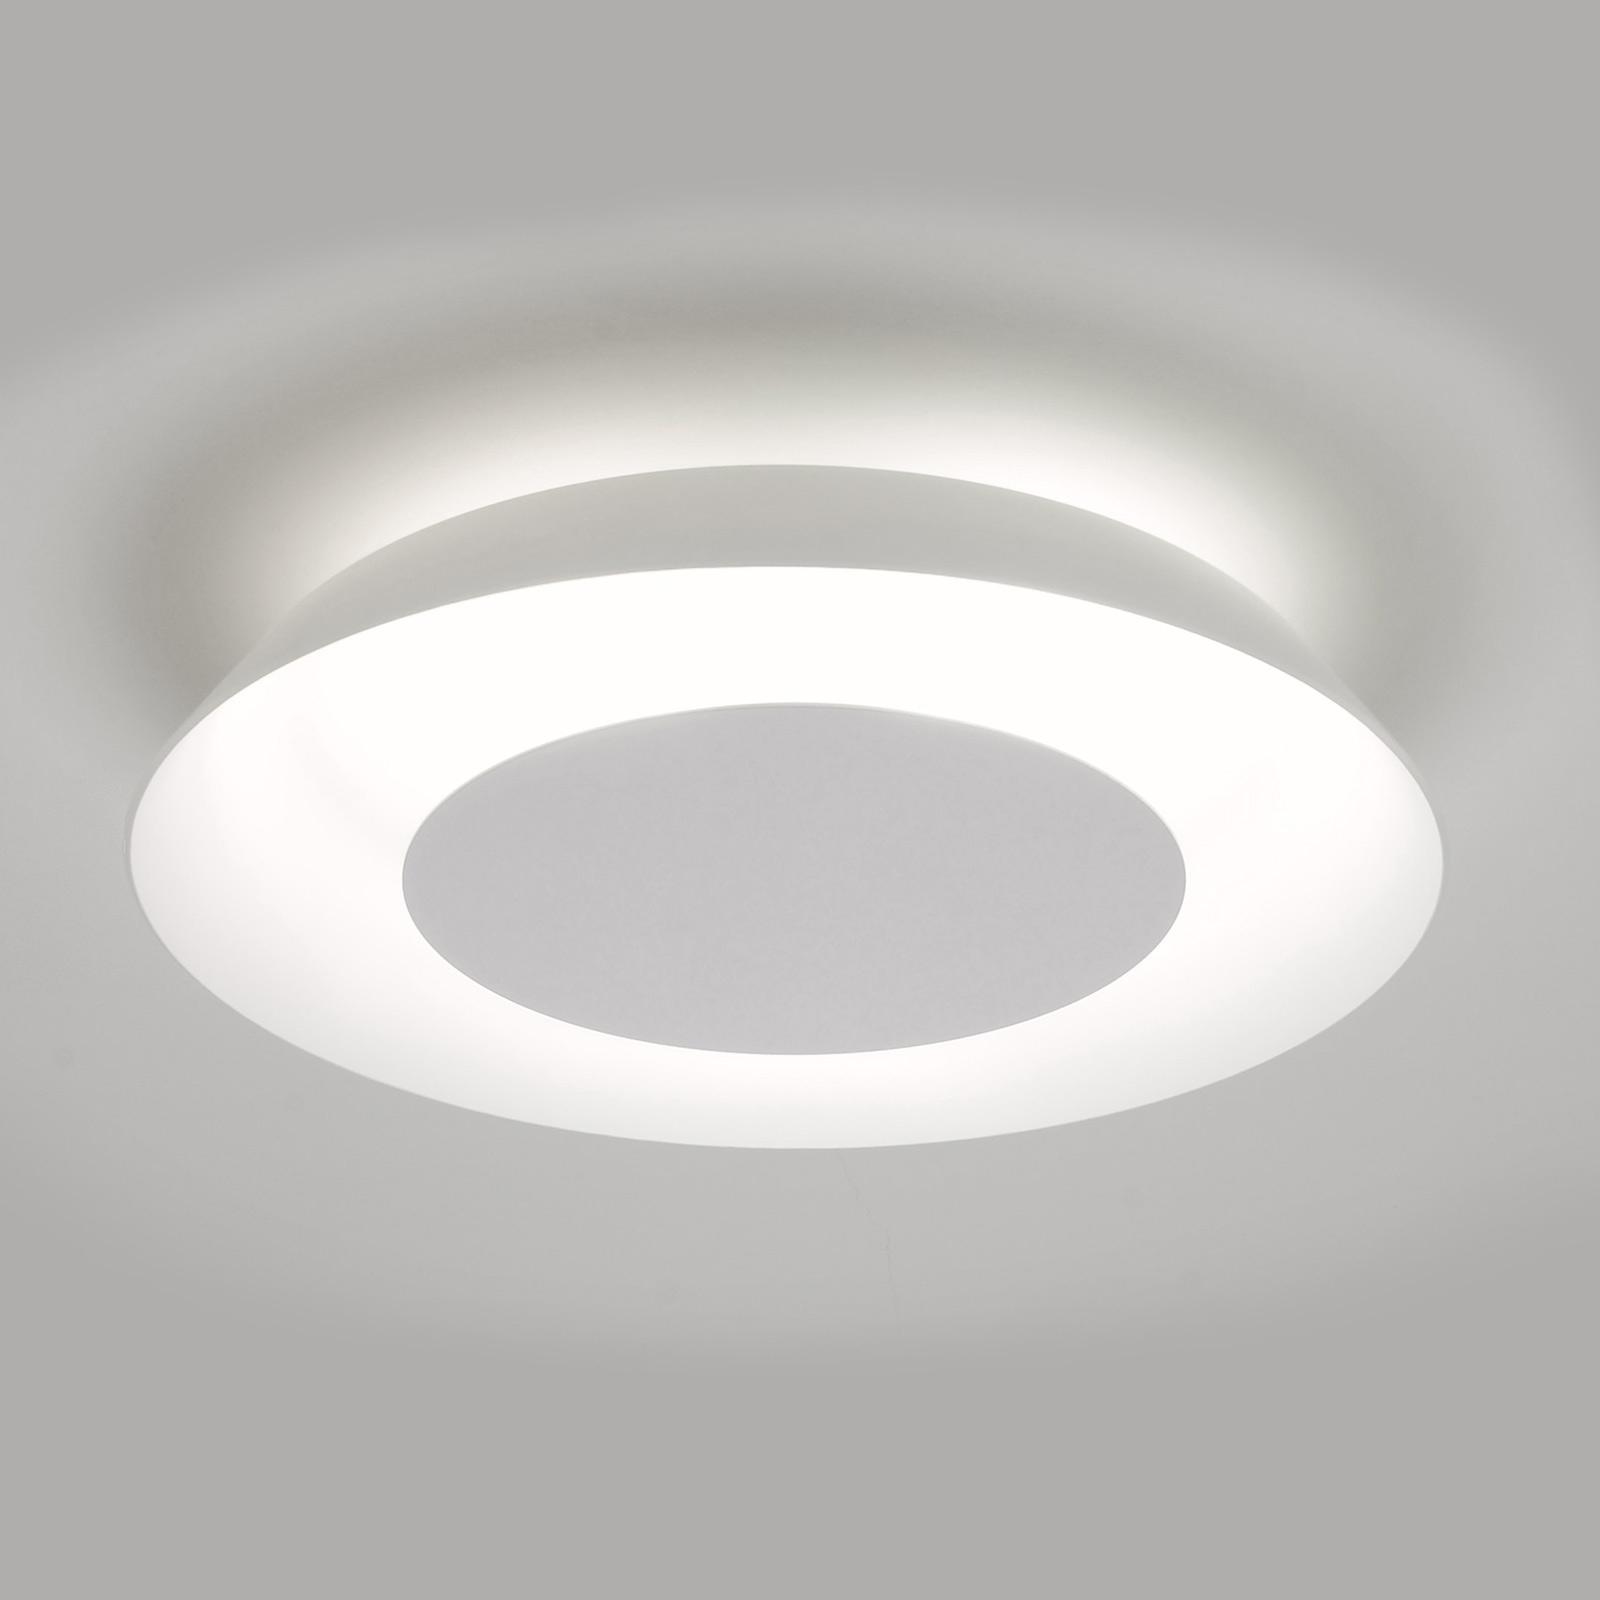 Casablanca Torno lampa sufitowa LED, Ø 40 cm